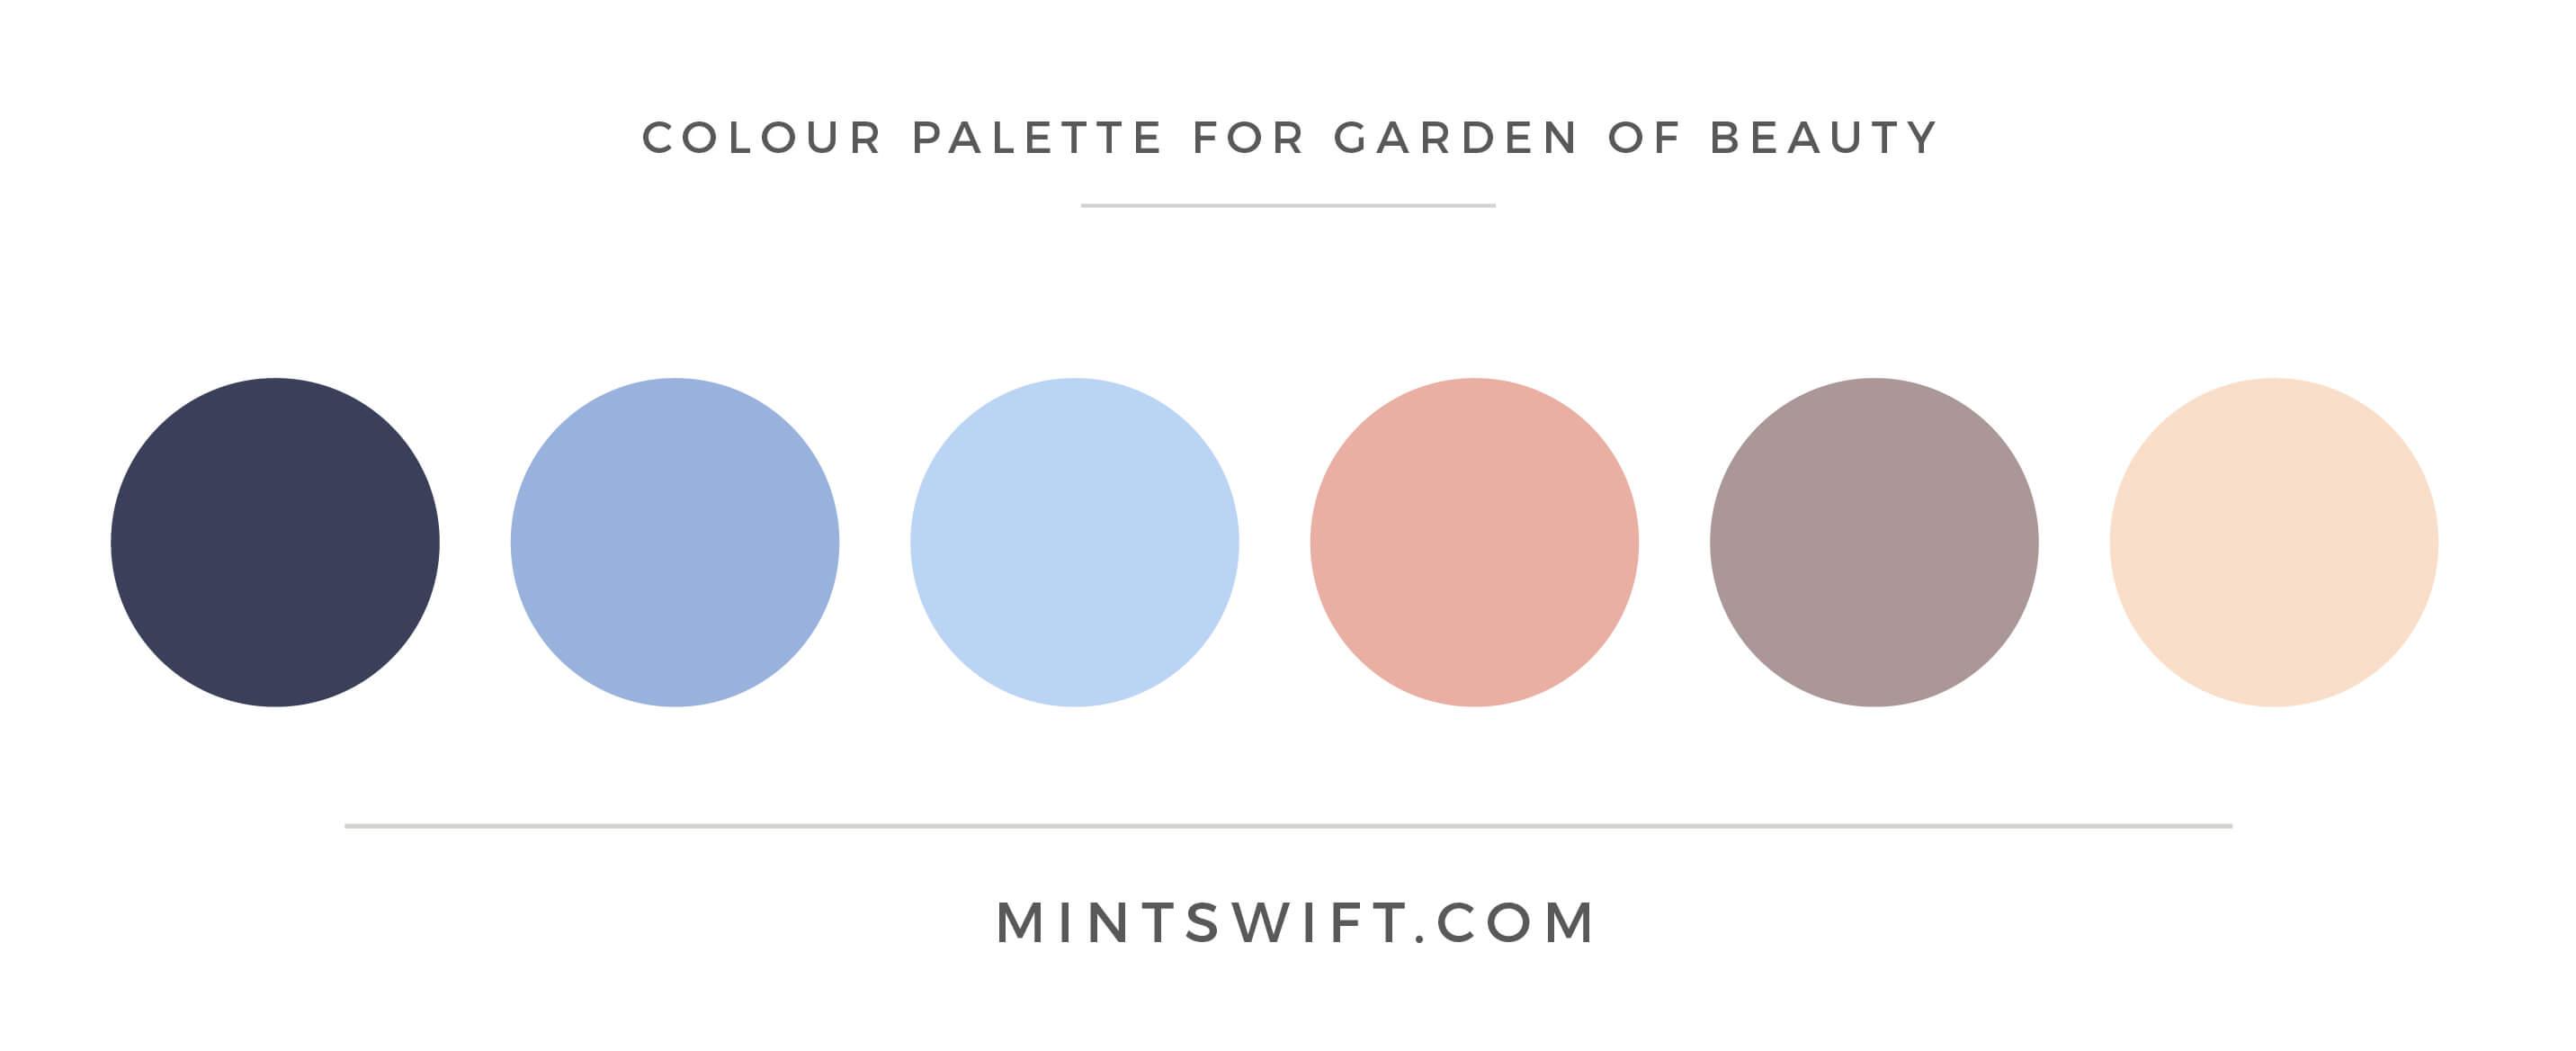 Garden of Beauty - Blog Categories Icons - Brand Design Package - MintSwift